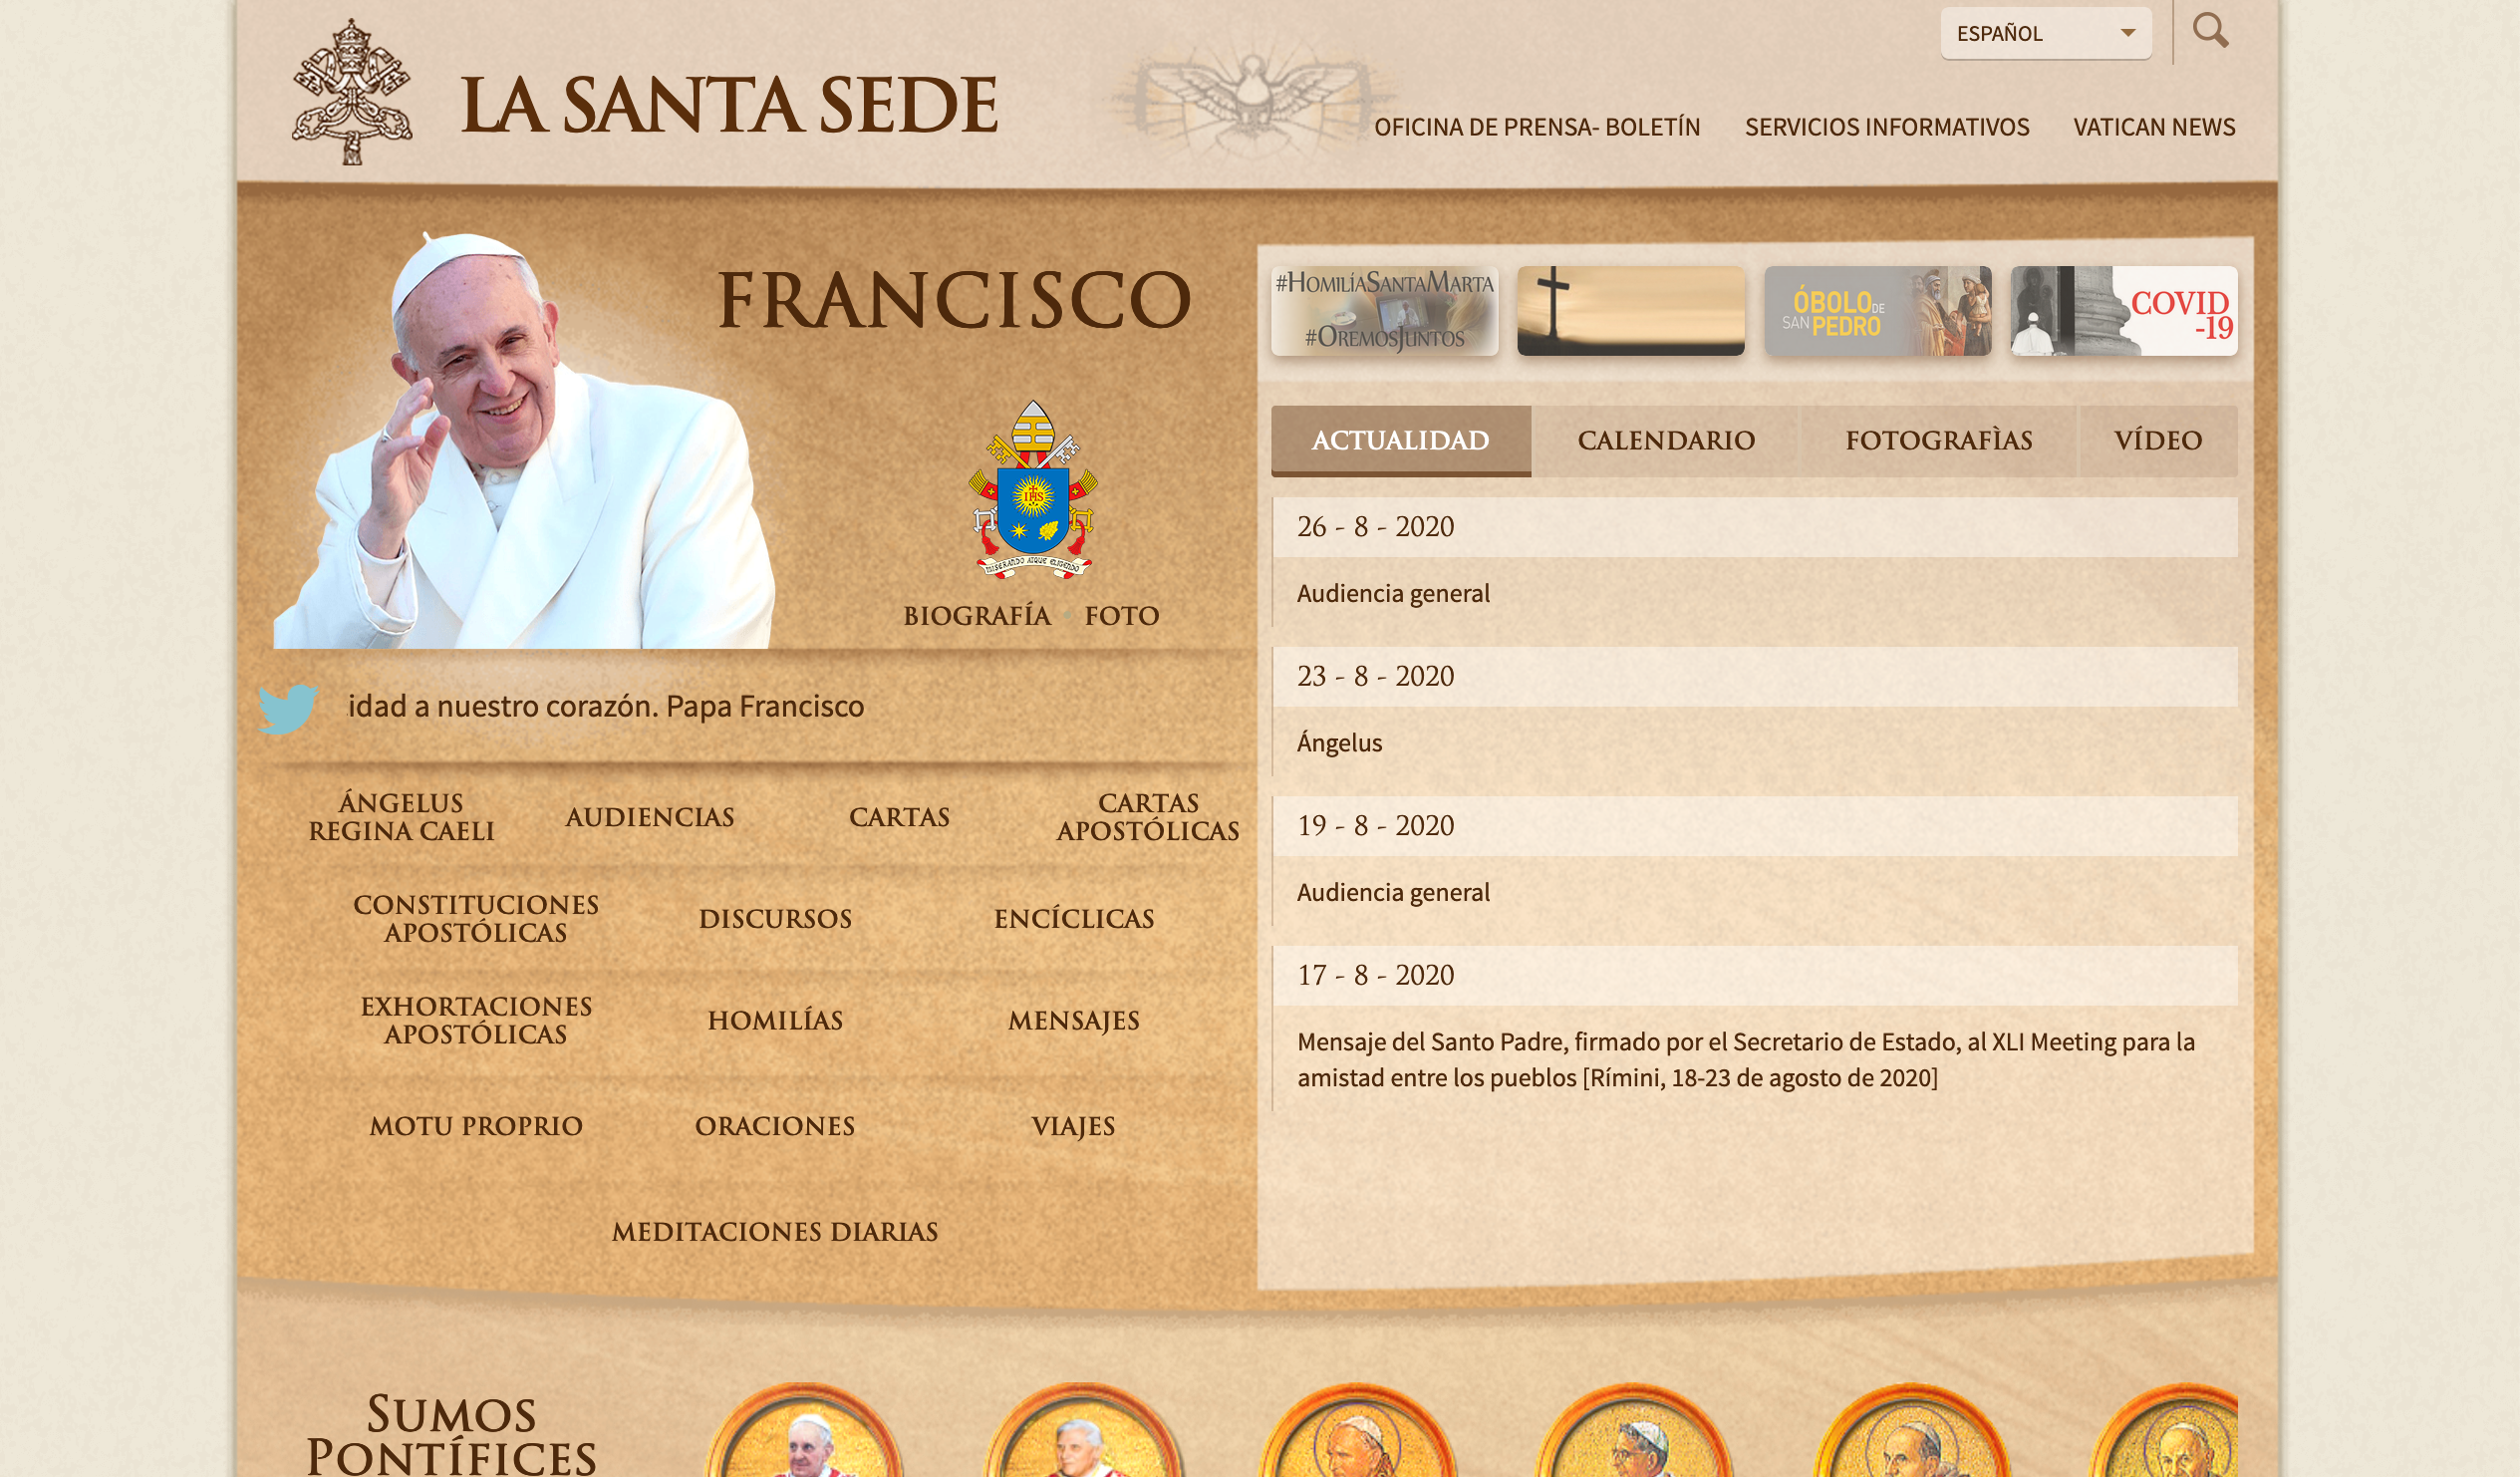 santa sede vatican